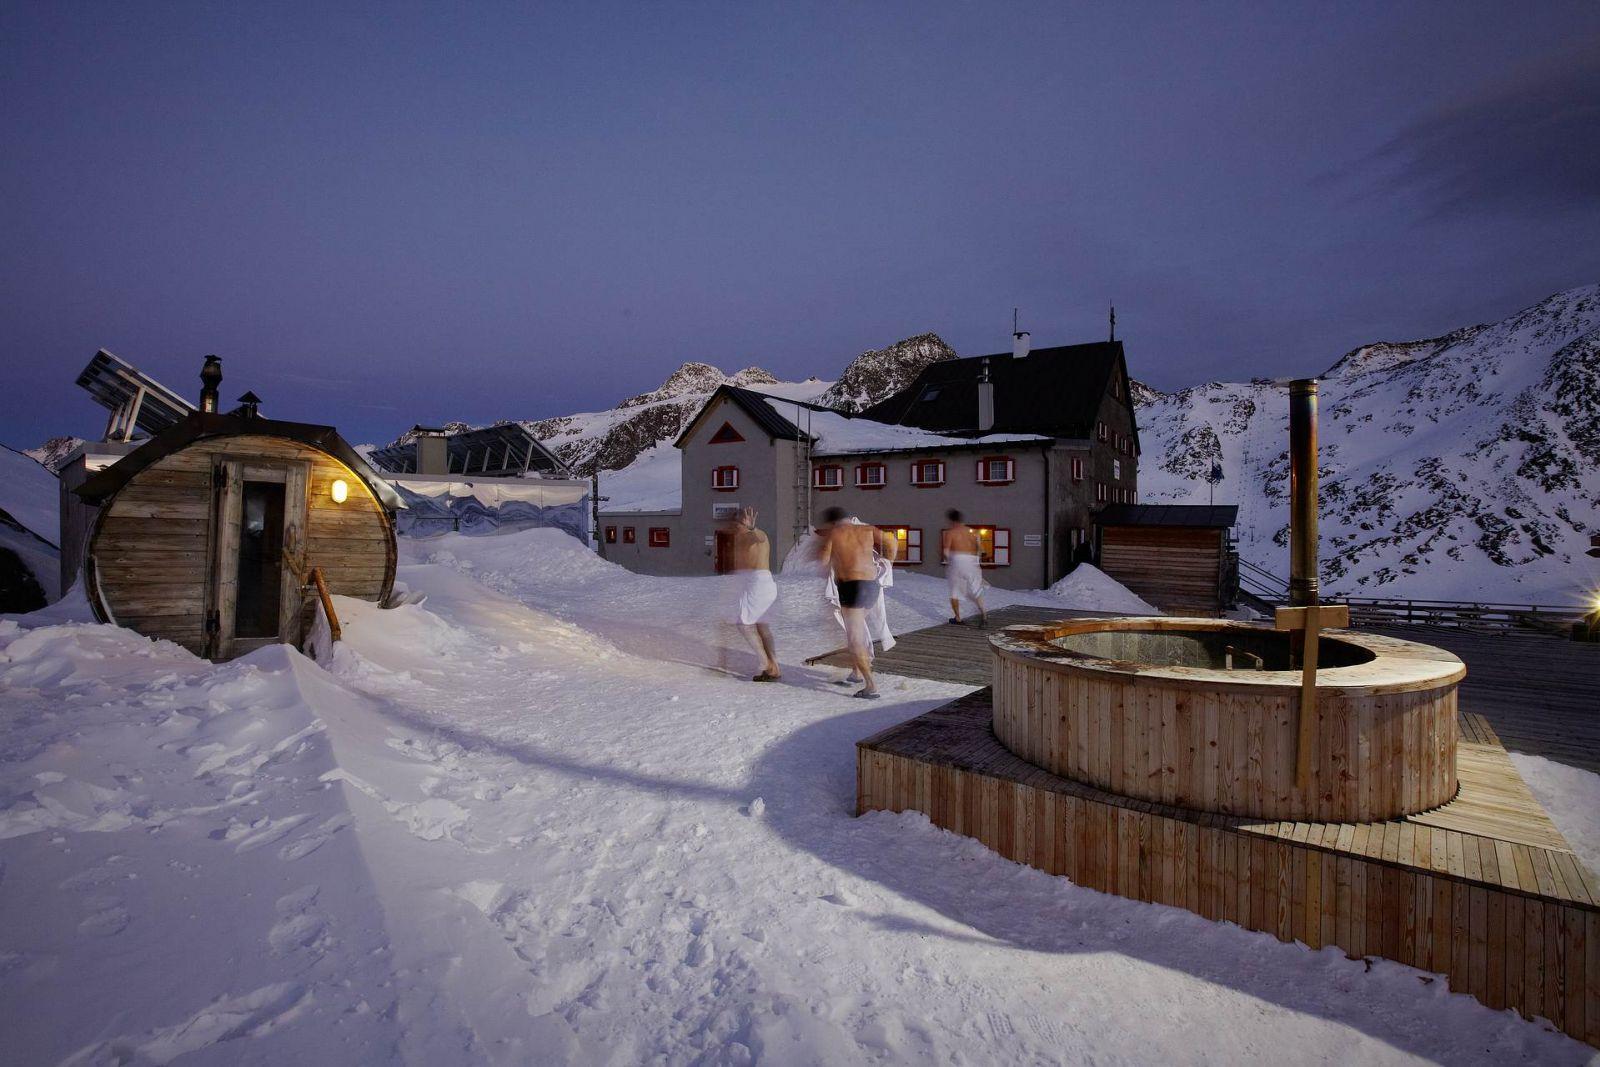 La sauna piu alta dEuropa  Rifugio Bella Vista